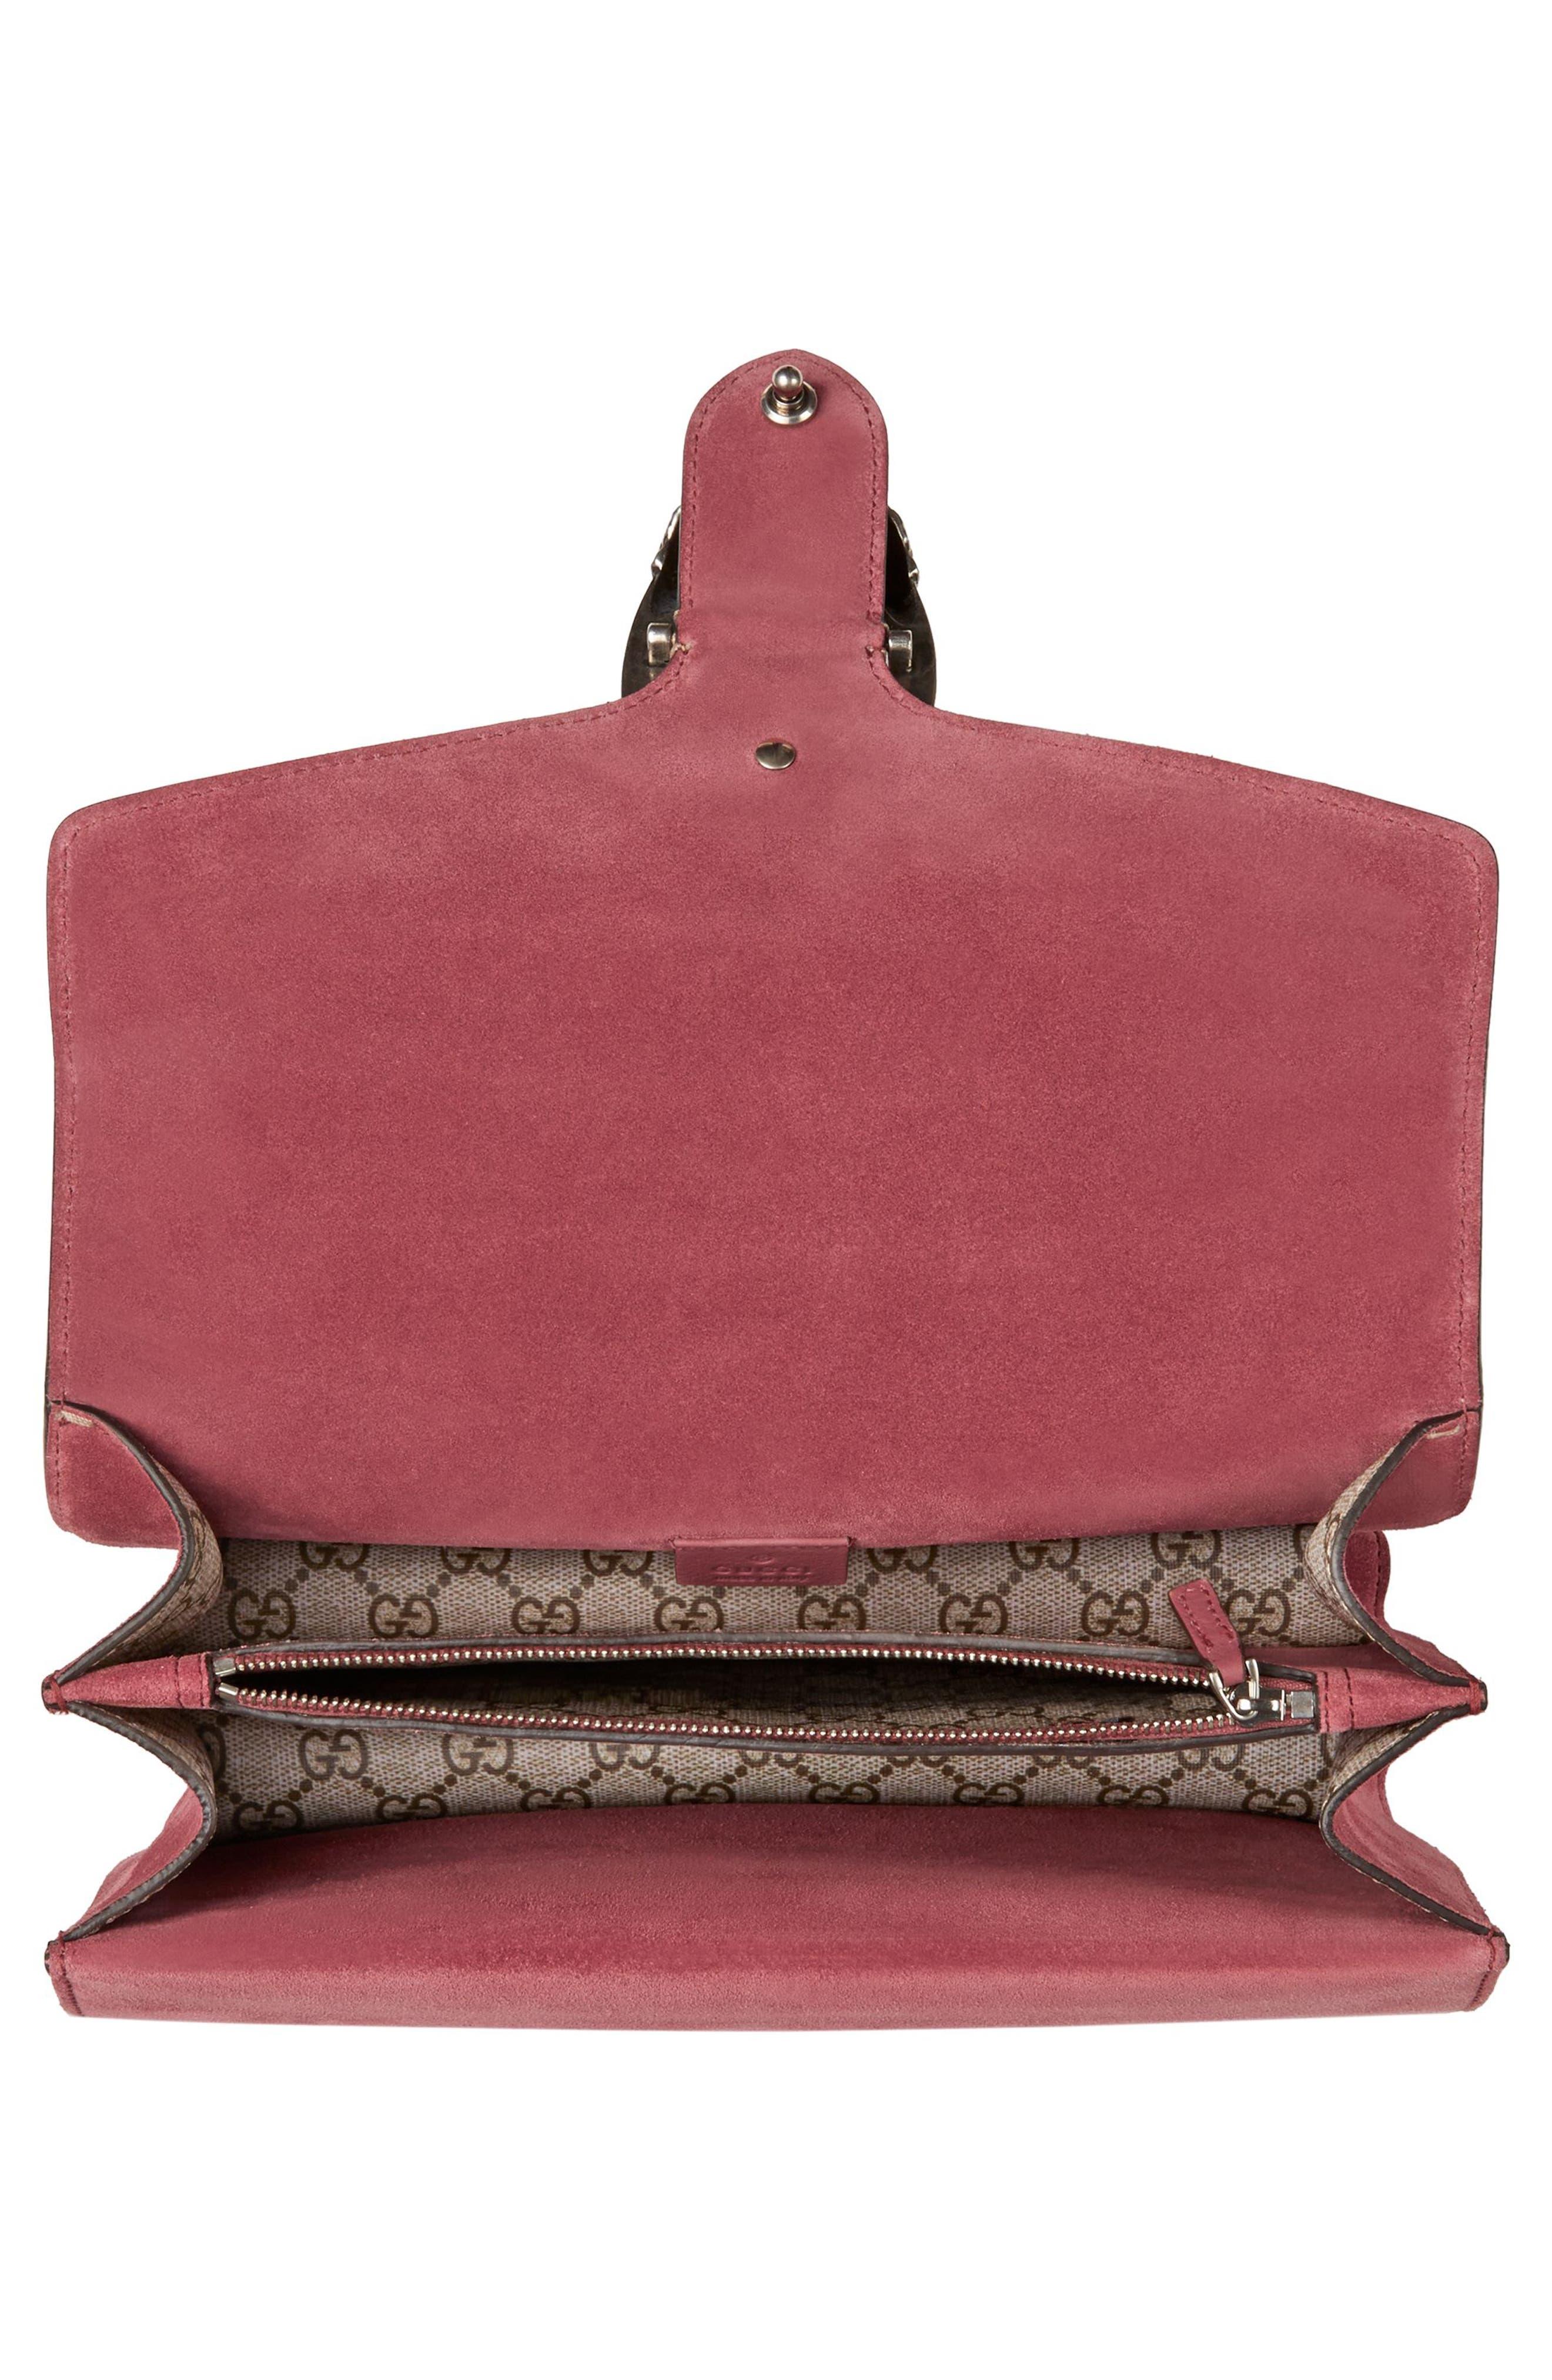 Small Dionysus Floral GG Supreme Canvas Shoulder Bag,                             Alternate thumbnail 3, color,                             Beige Ebony/ Dry Rose